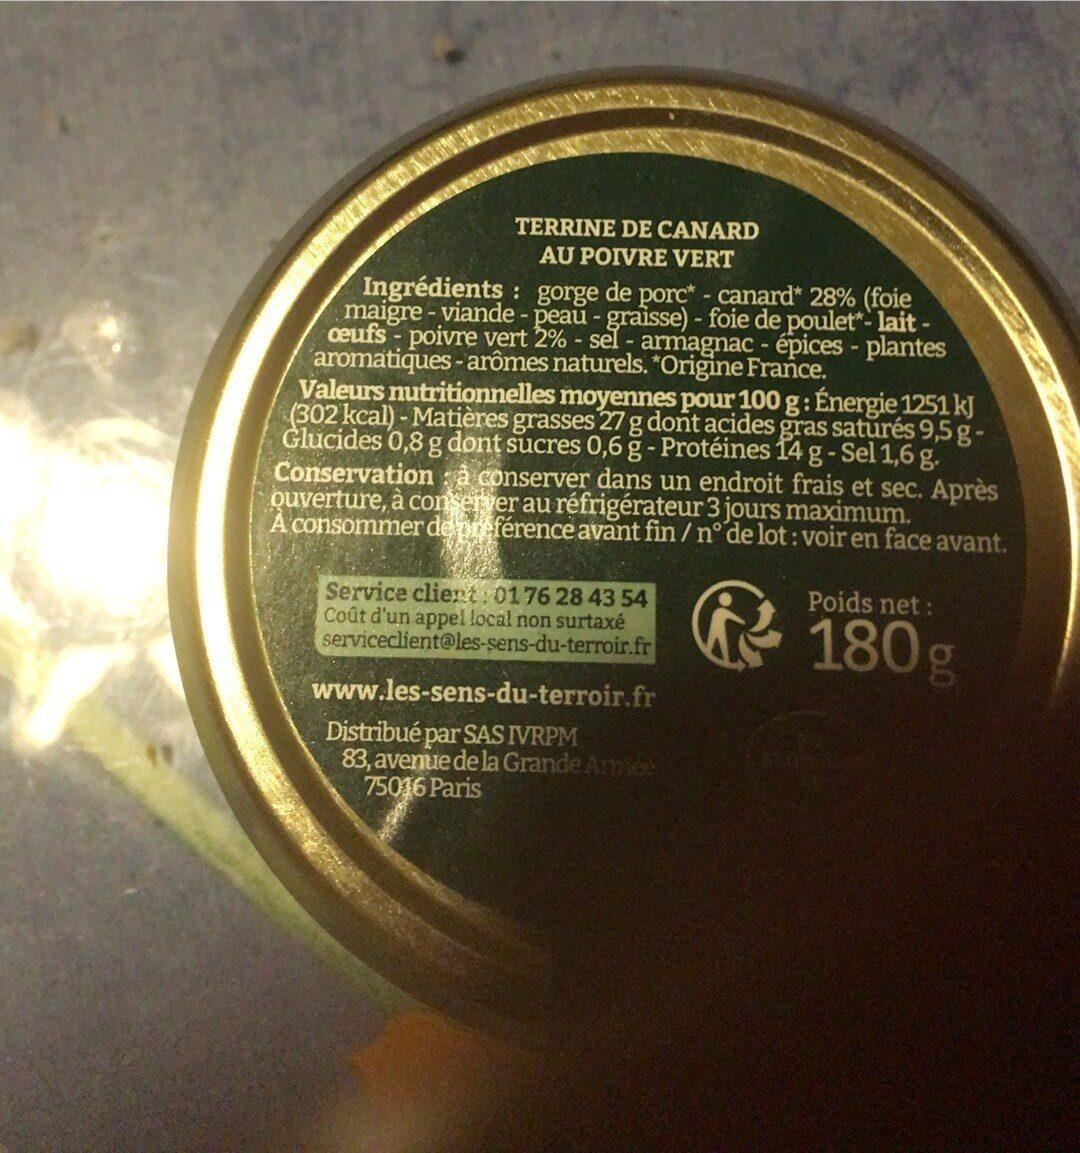 Terrine de canard - Informations nutritionnelles - fr